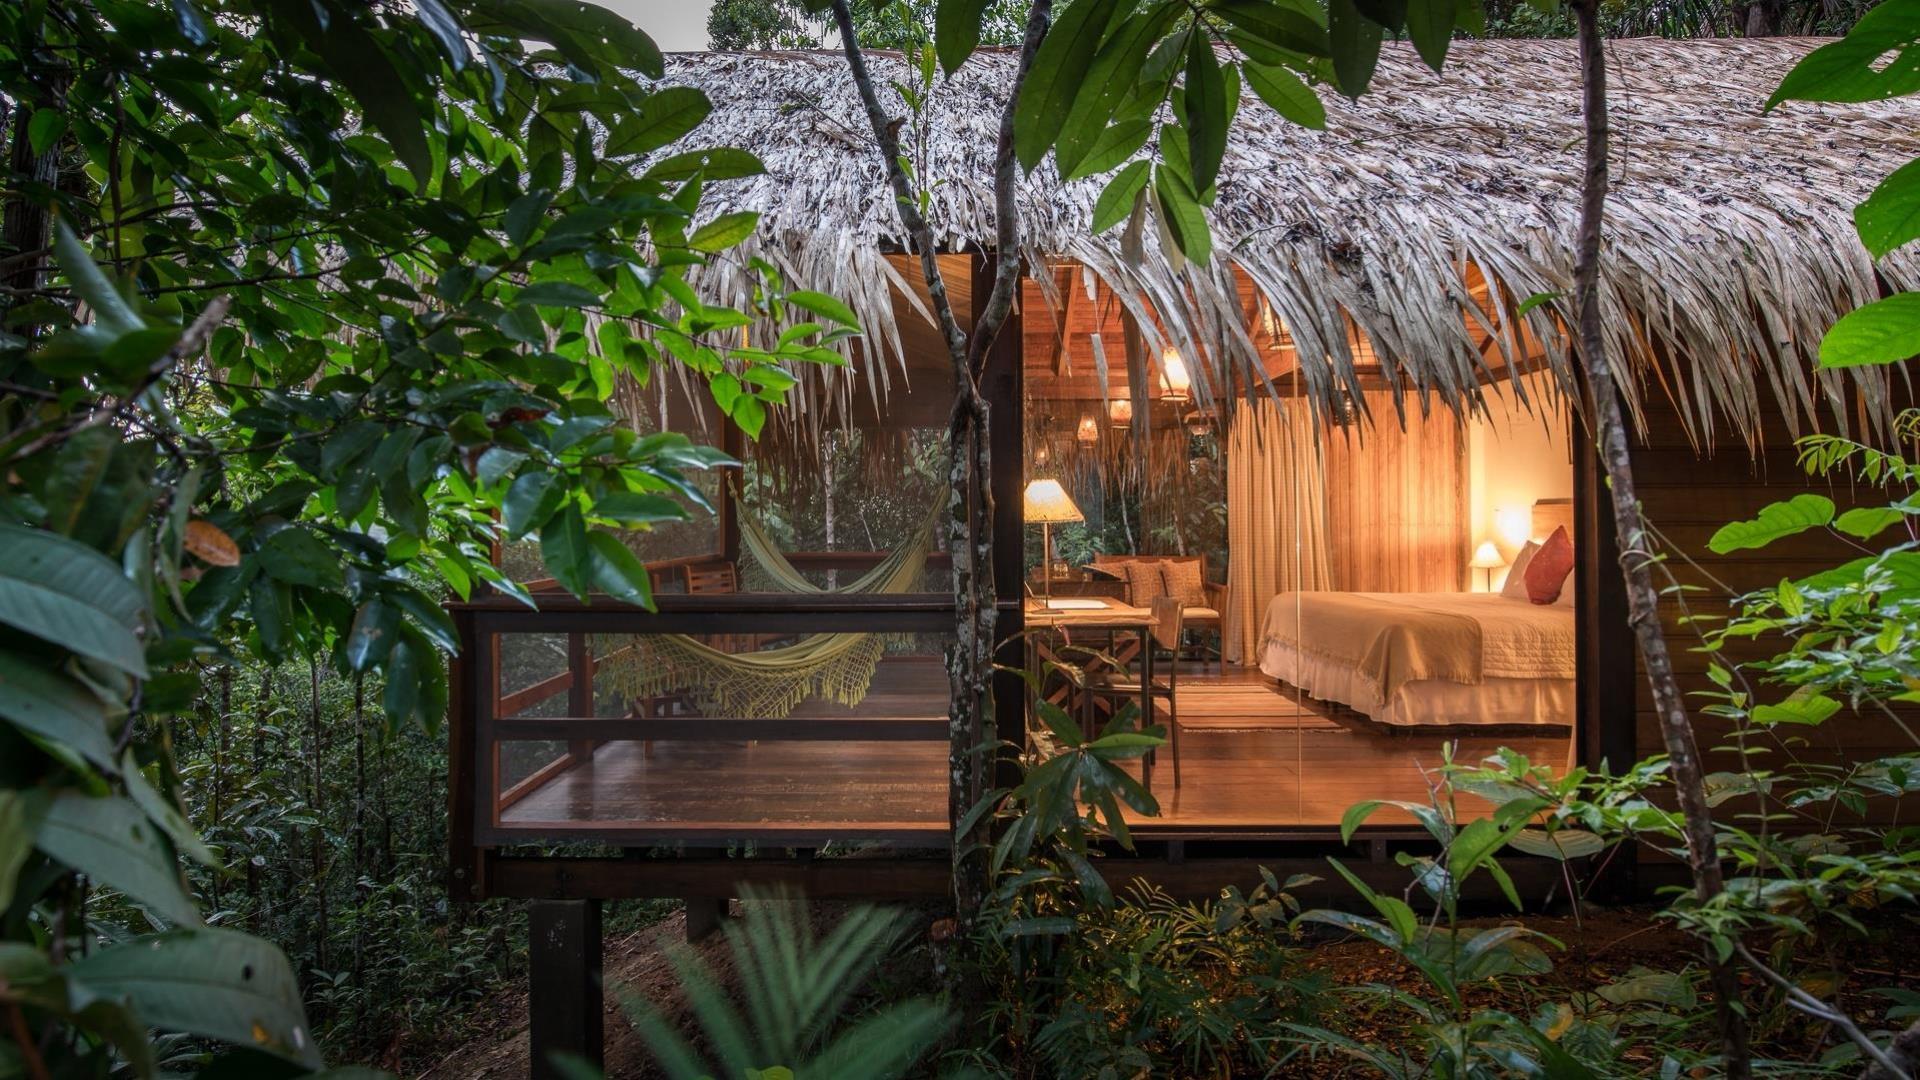 Brasilien Amazonas: 6 Tage Reisebaustein - Anavilhanas Jungle Lodge